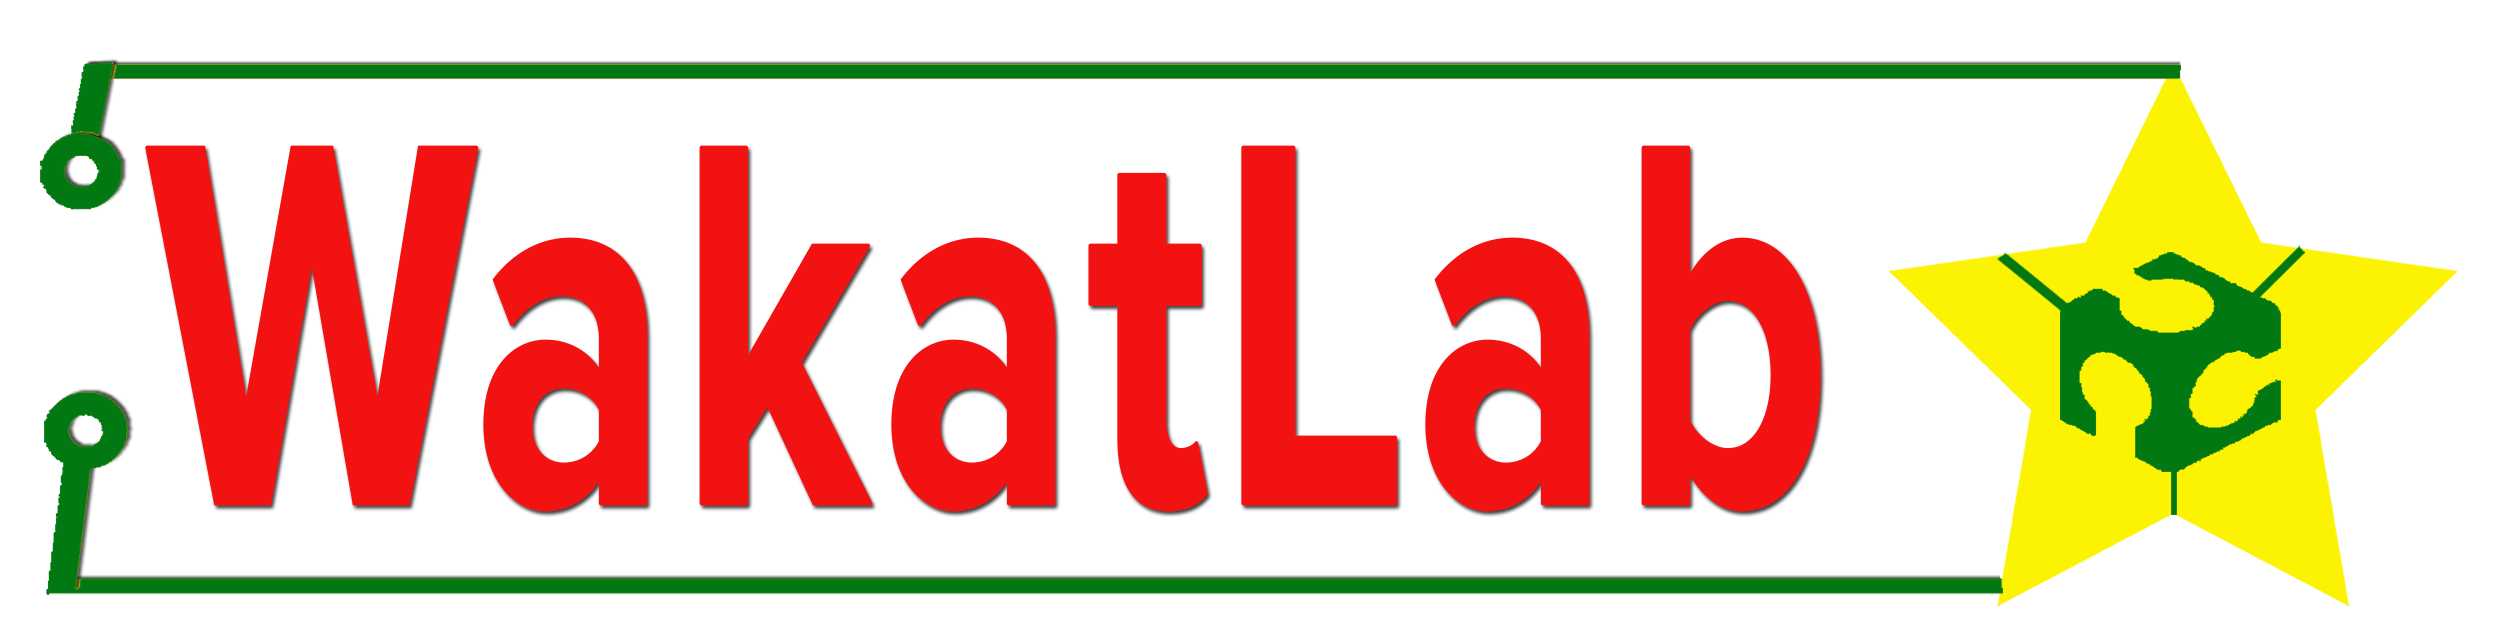 WakatLab